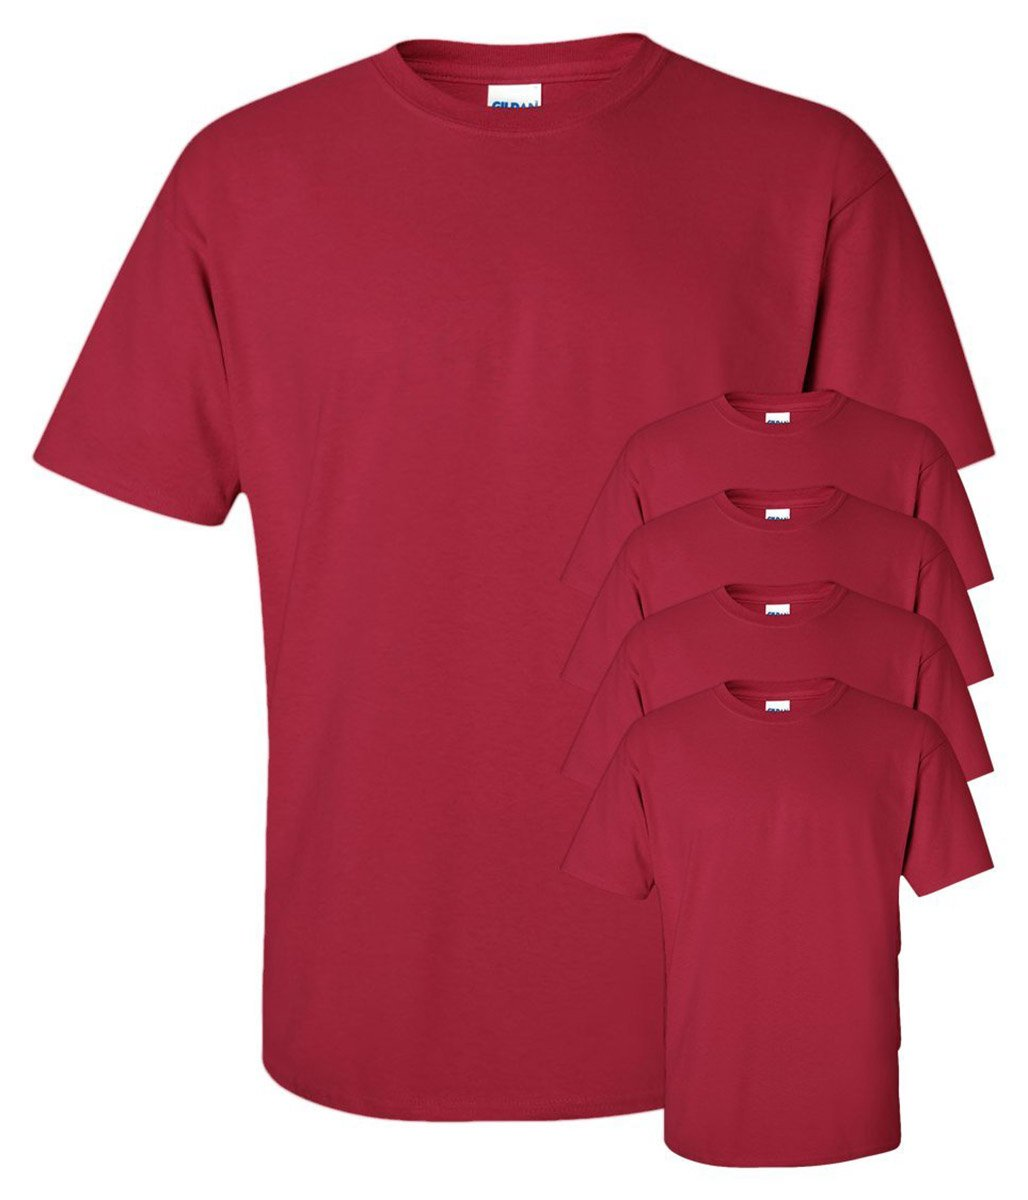 Gildan Men's Seamless Double Needle T-Shirt, Cardinal Red, L (Pack of 5)